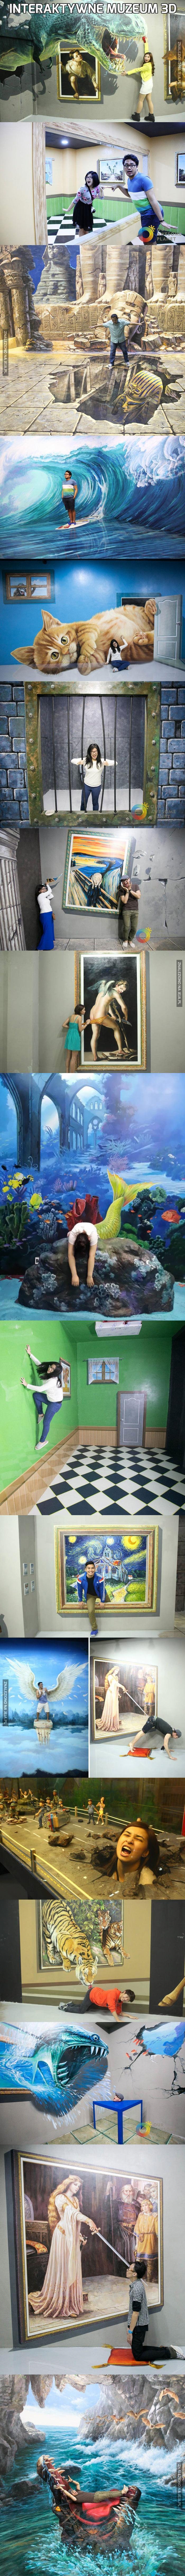 Interaktywne muzeum 3D